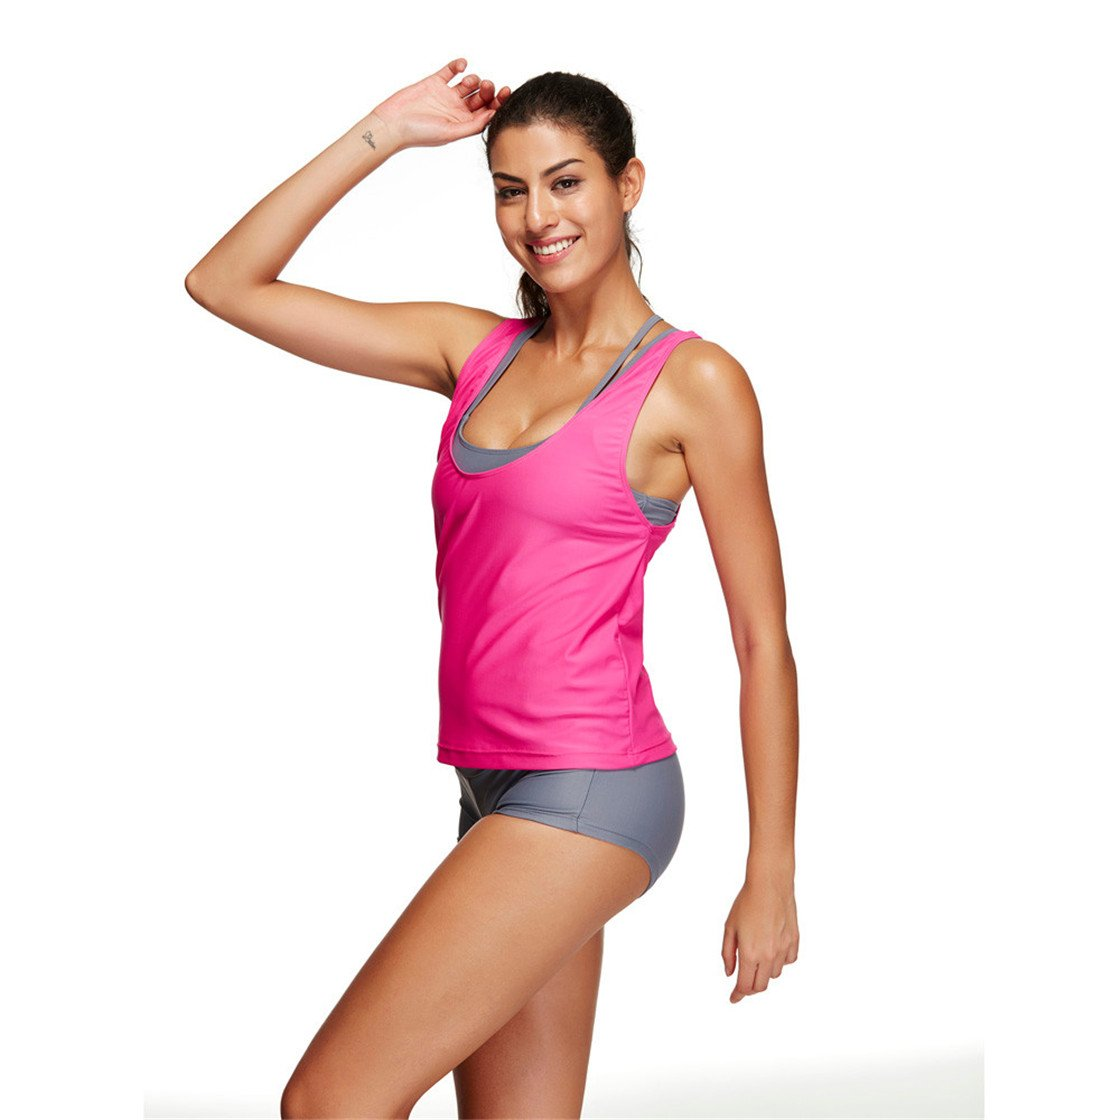 MOSE Women Sports Bikini Pure Color Beach Bathing Two Pieces Beachwear Set (Hot Pink, 3XL)